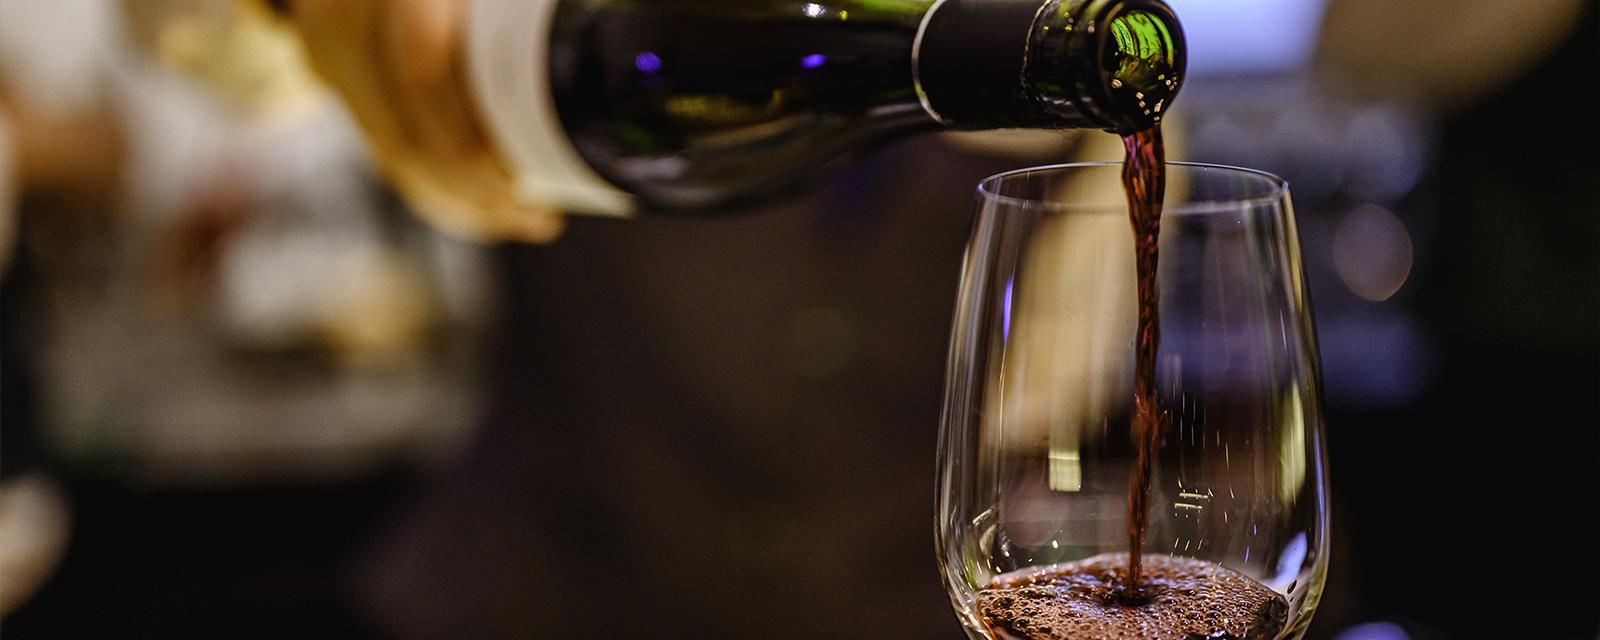 Vino Lounge Bar Hotel dei Giardini